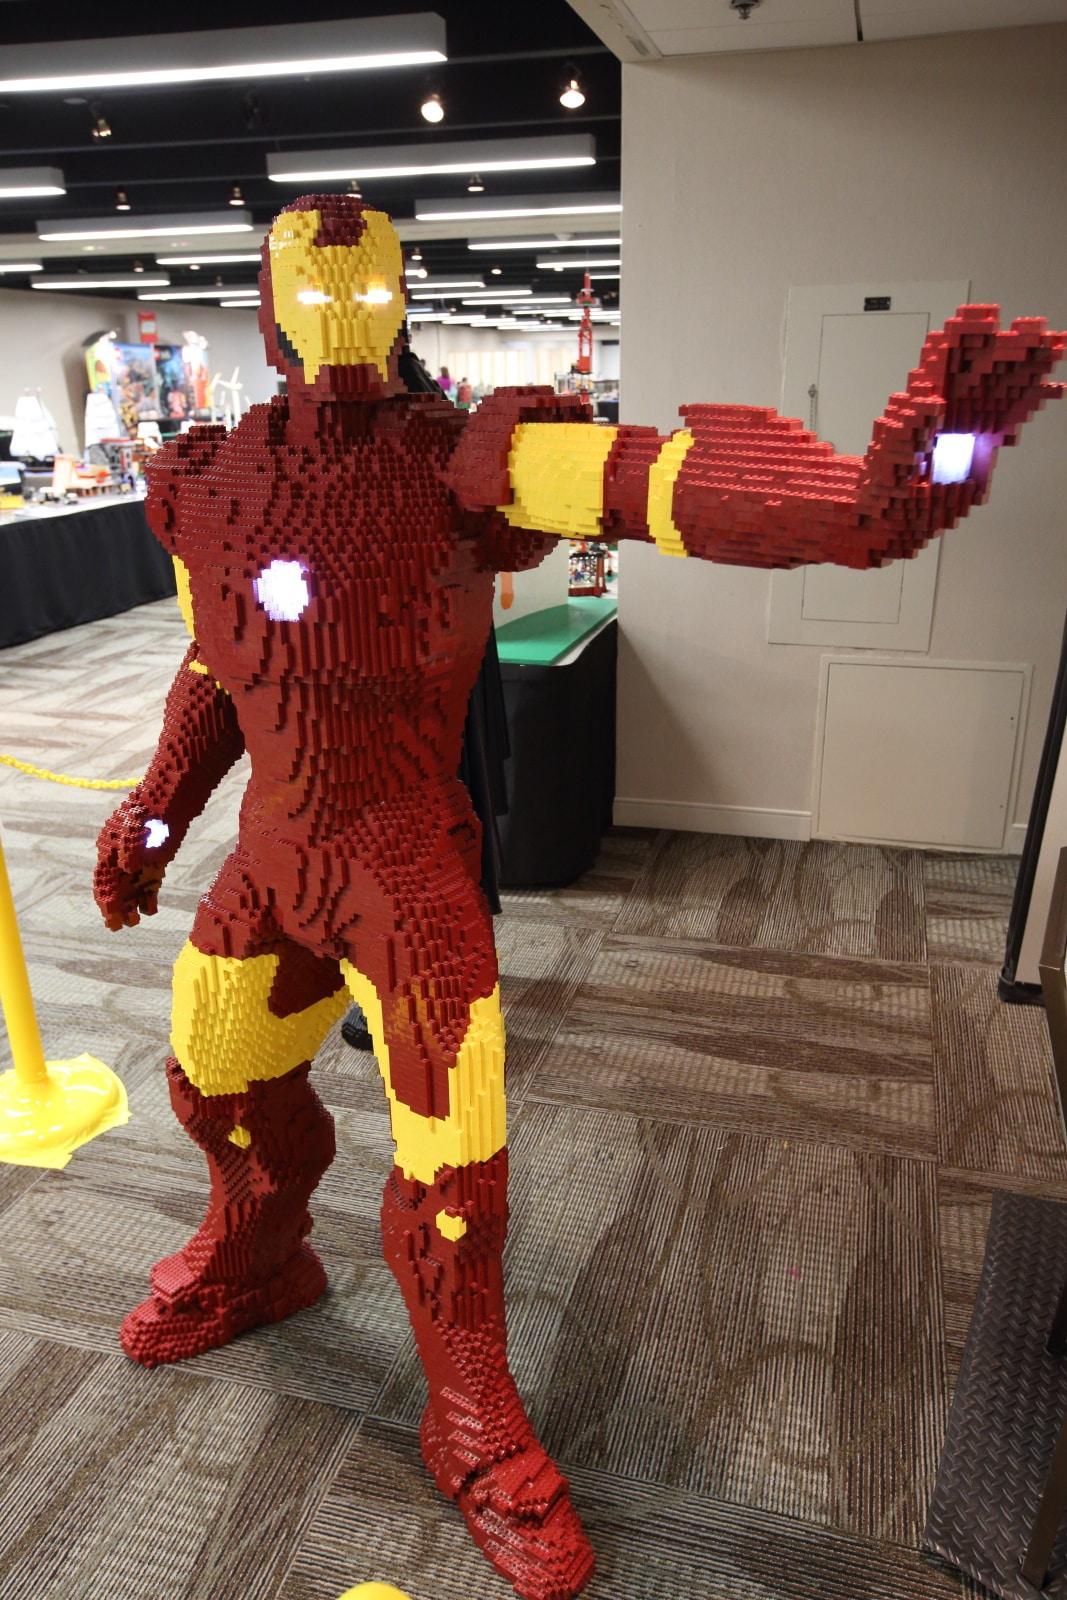 Iron Man Lego Build Is An Epic Life Sized Brick Marvel